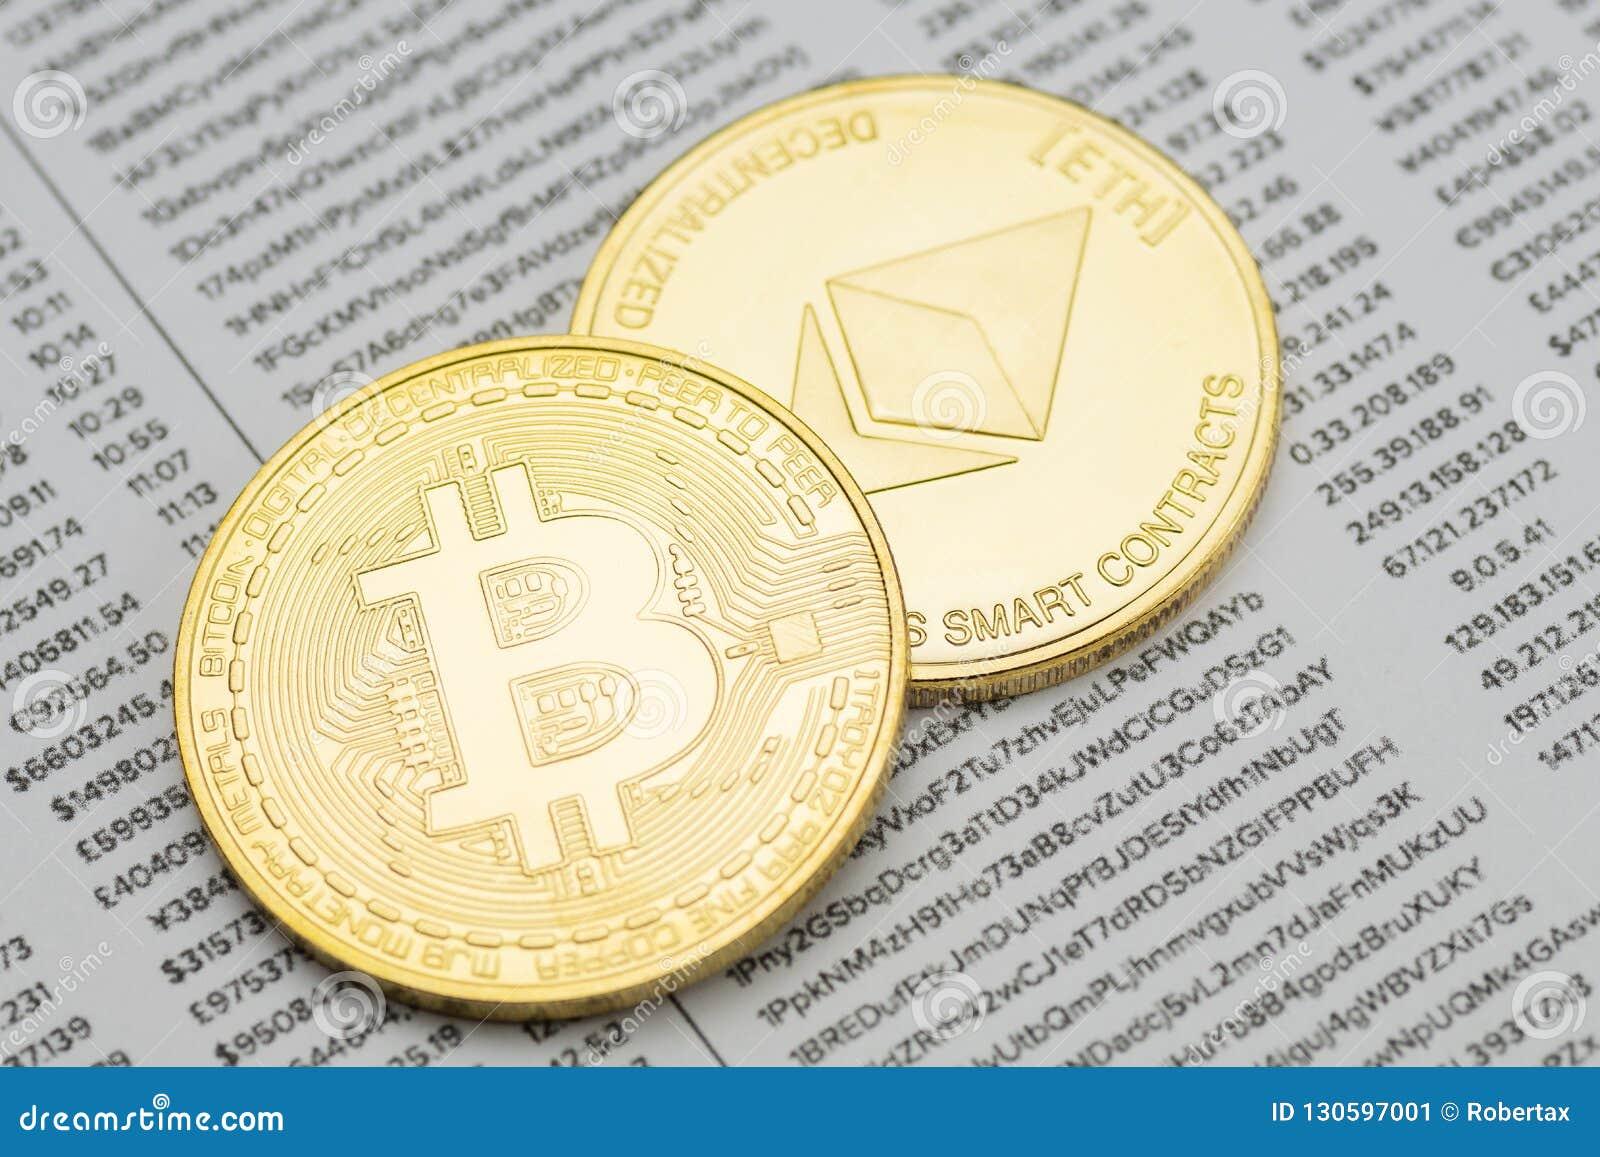 ethereum digital currency list